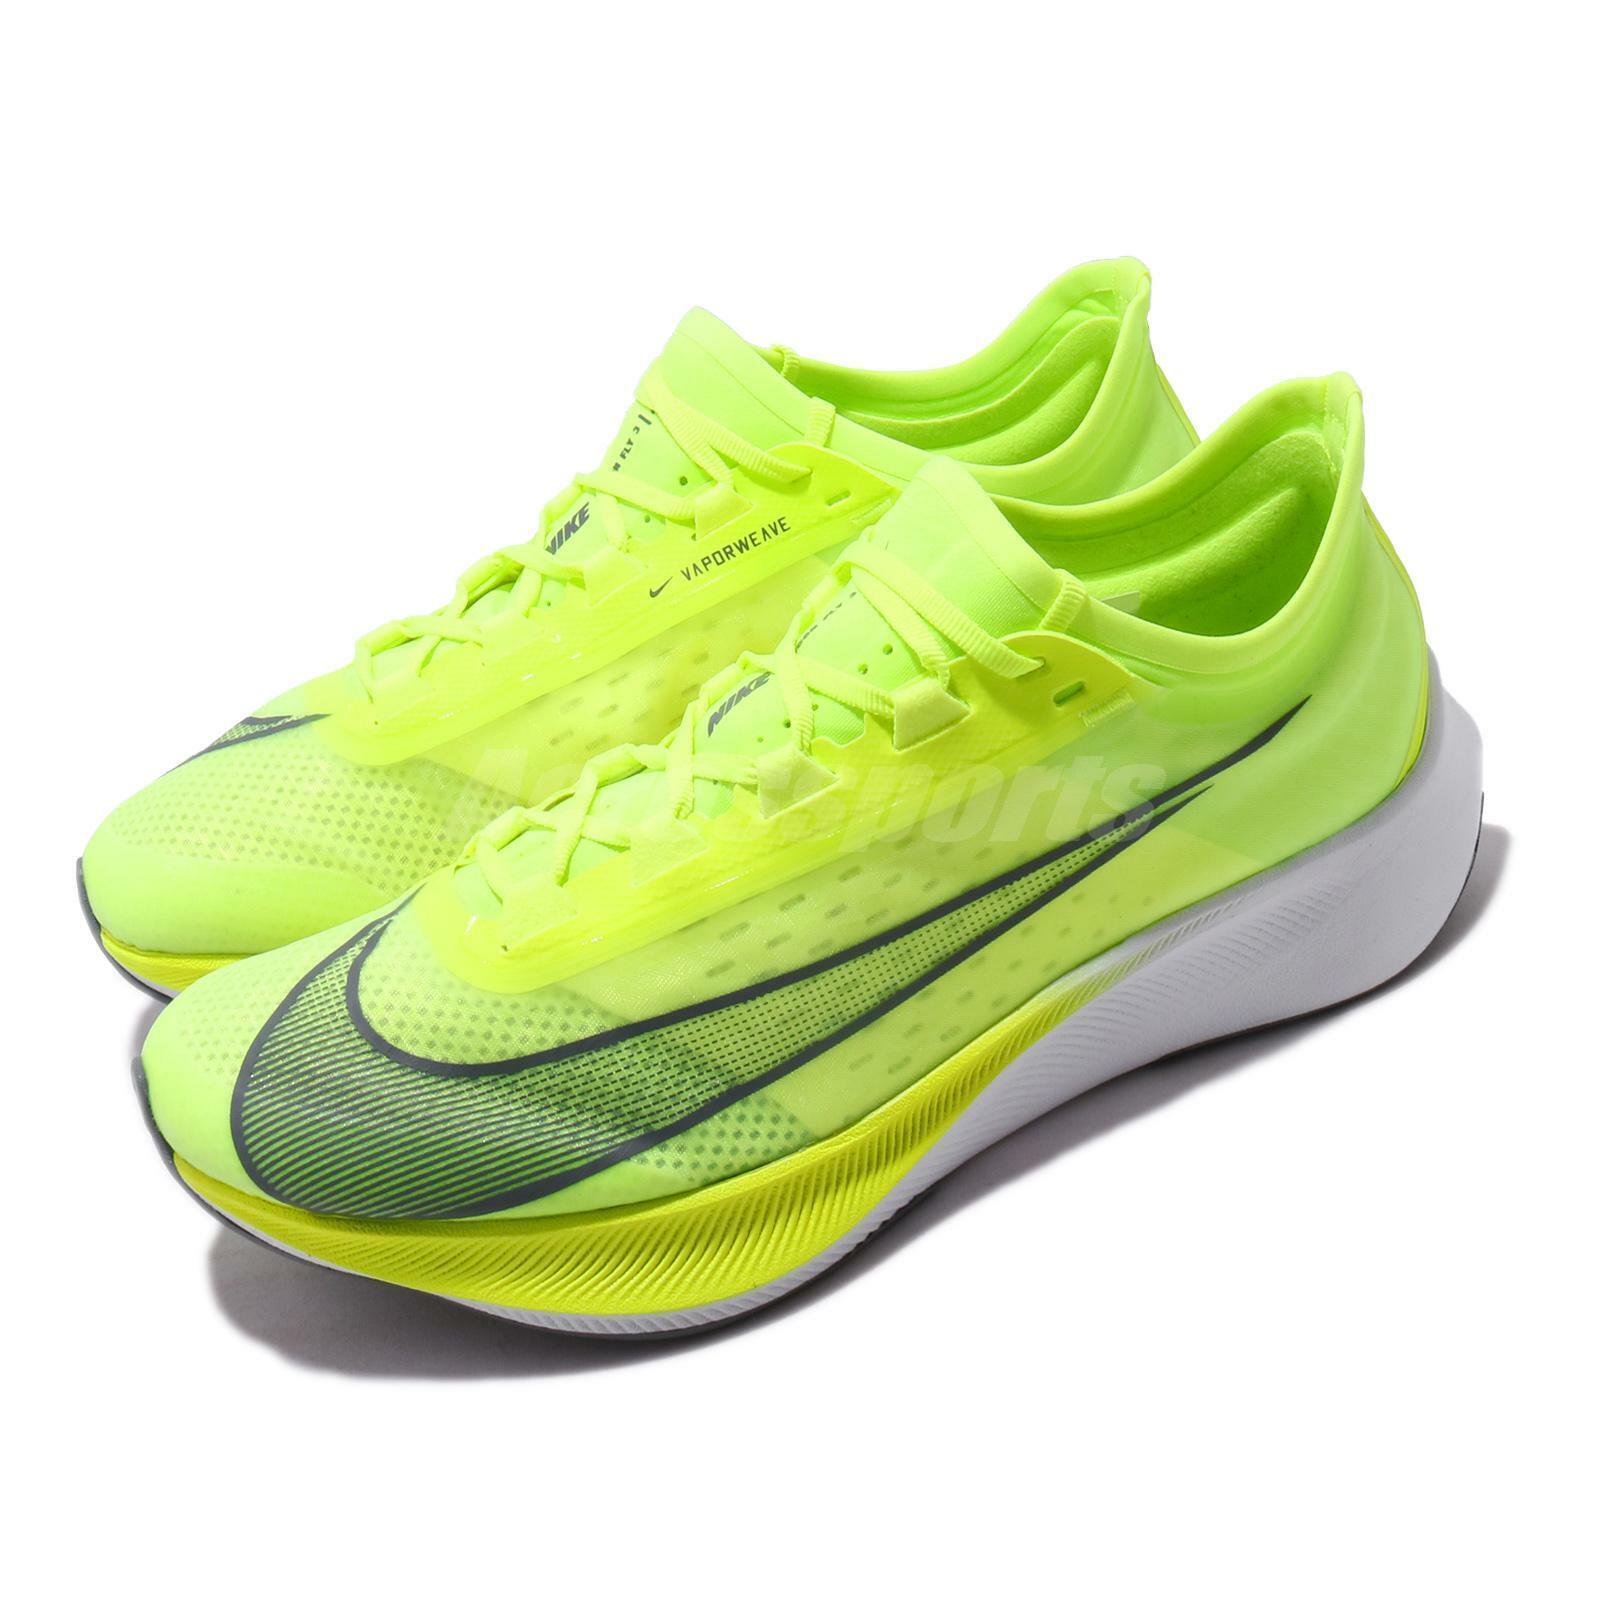 Atomic Pink Nike Air Zoom Winflo 2 WMNS Nike Zoom Winflo 2 Grey Orange Running Shoes SNEAKERS 807279 ...